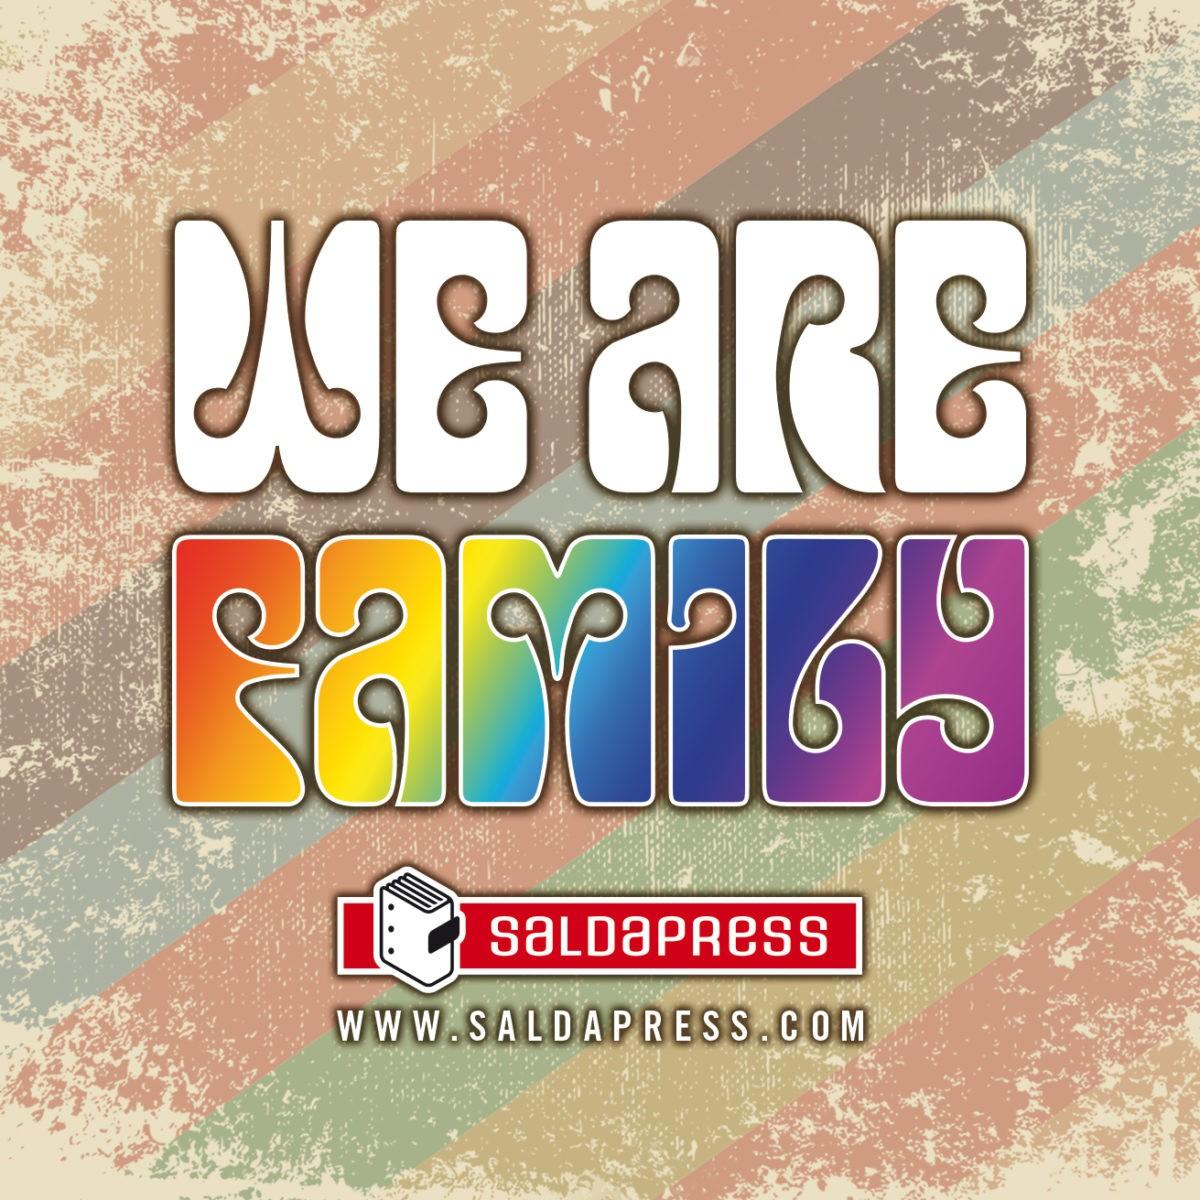 We are family: i titoli Saldapress online gratis